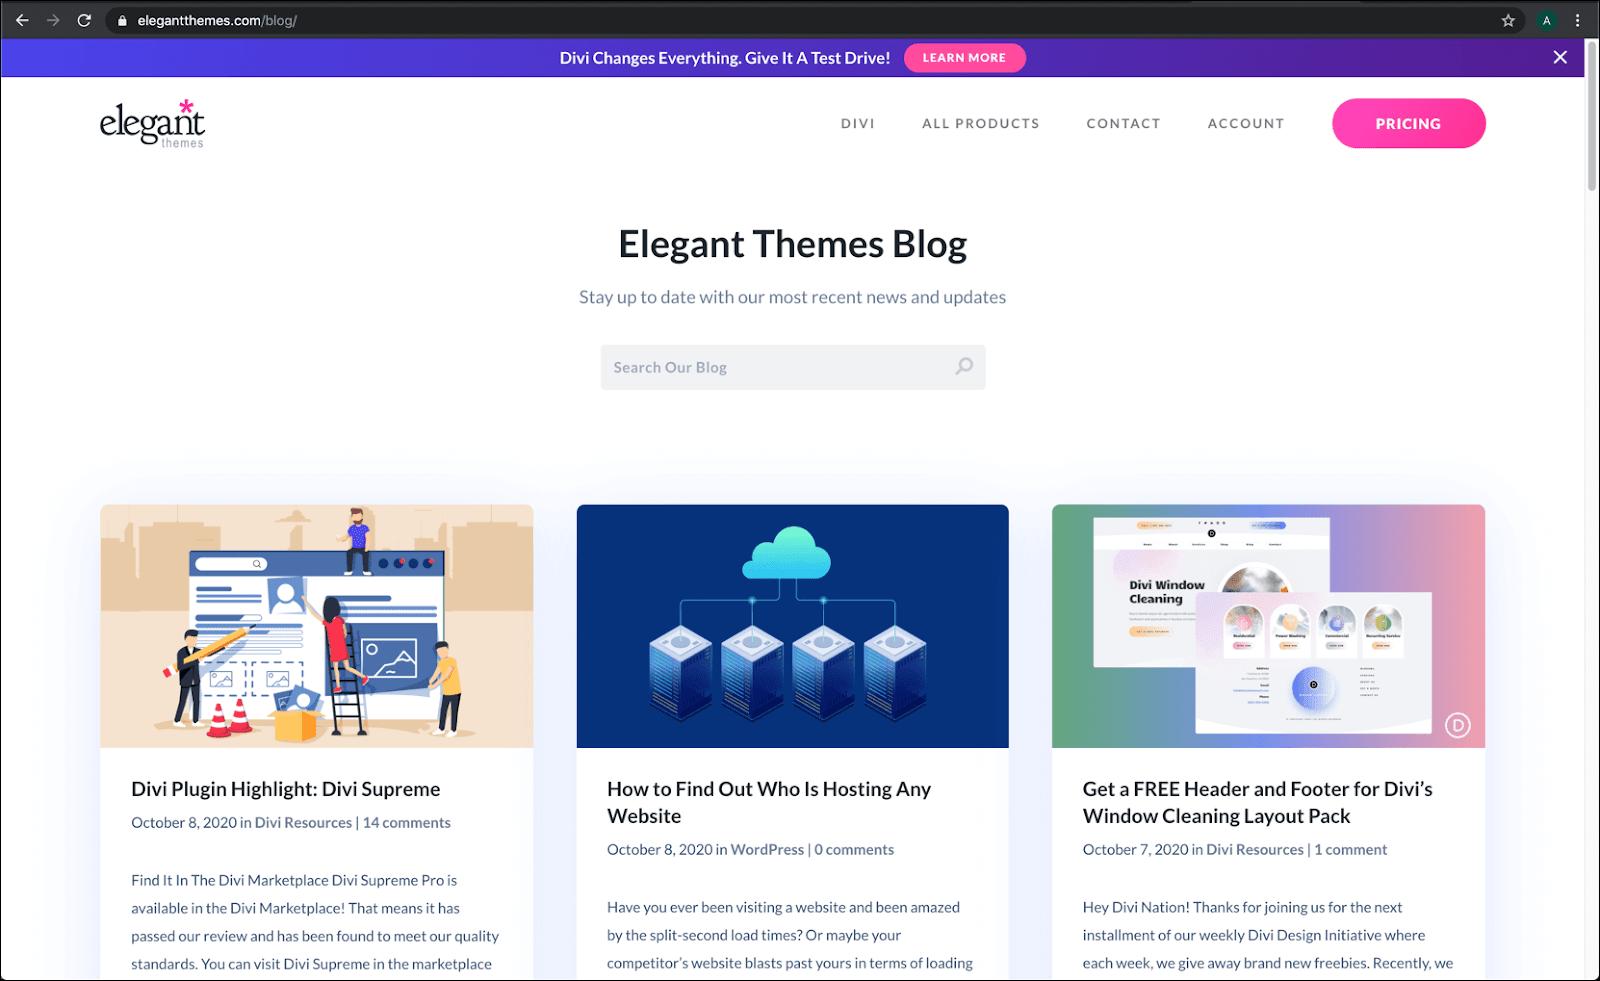 Corporate type of blog